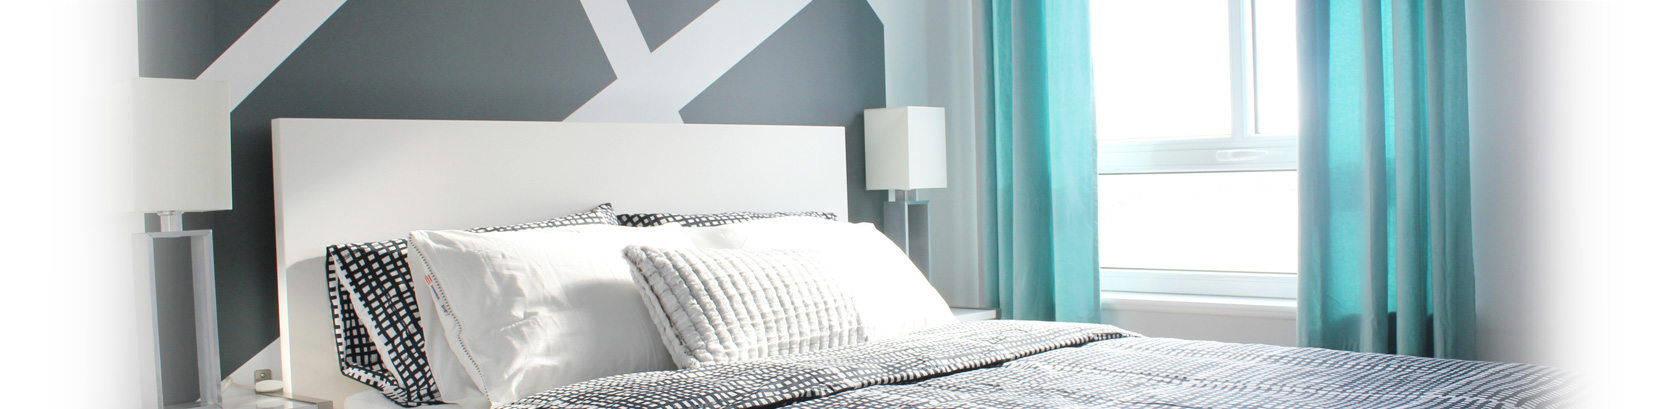 White headboard, crystal lamp, silk curtains, graphic pillows